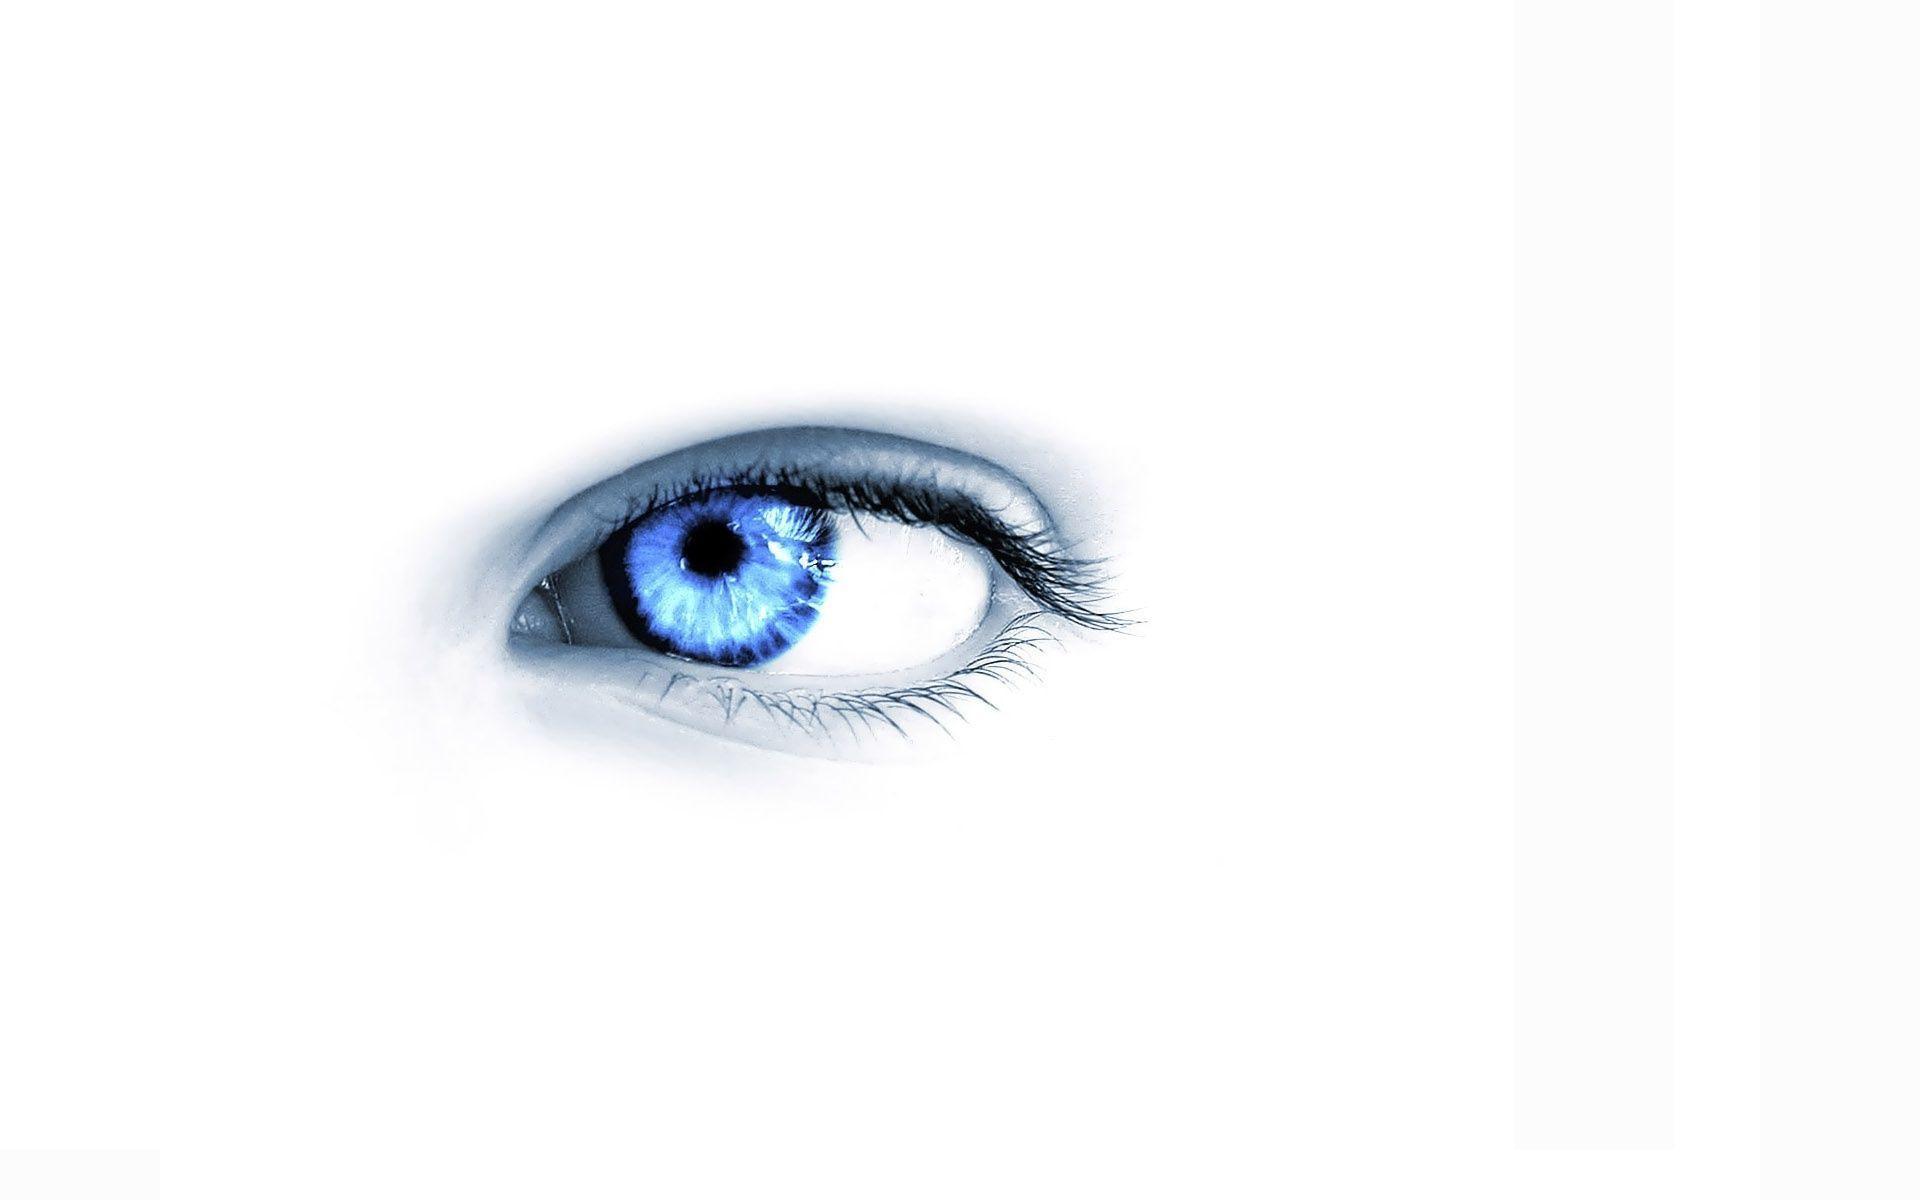 blue eyes wallpaper 2048x1152 - photo #13